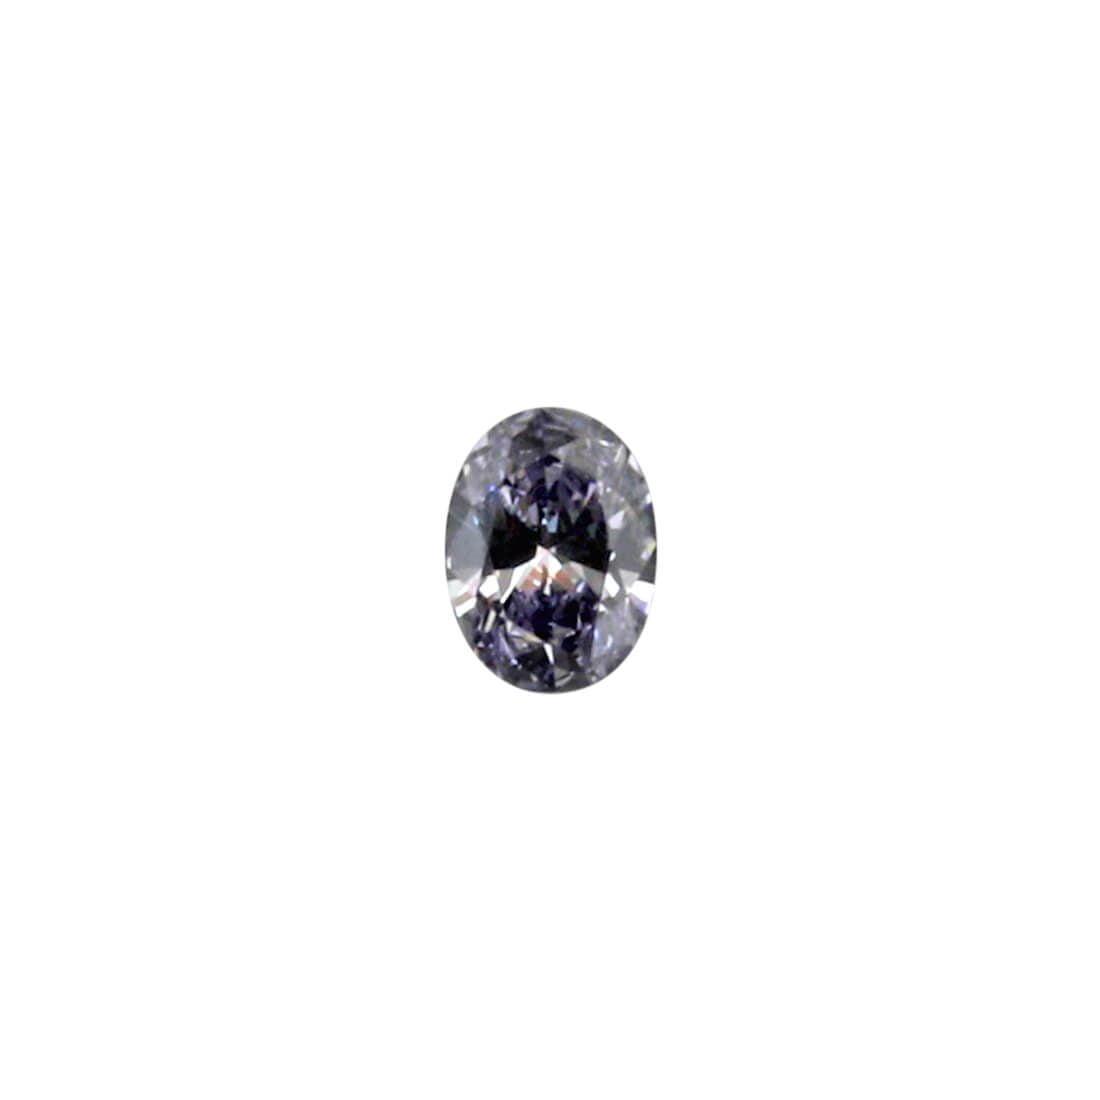 0.08ct Natural Fancy Purplish Blue Argyle Diamond